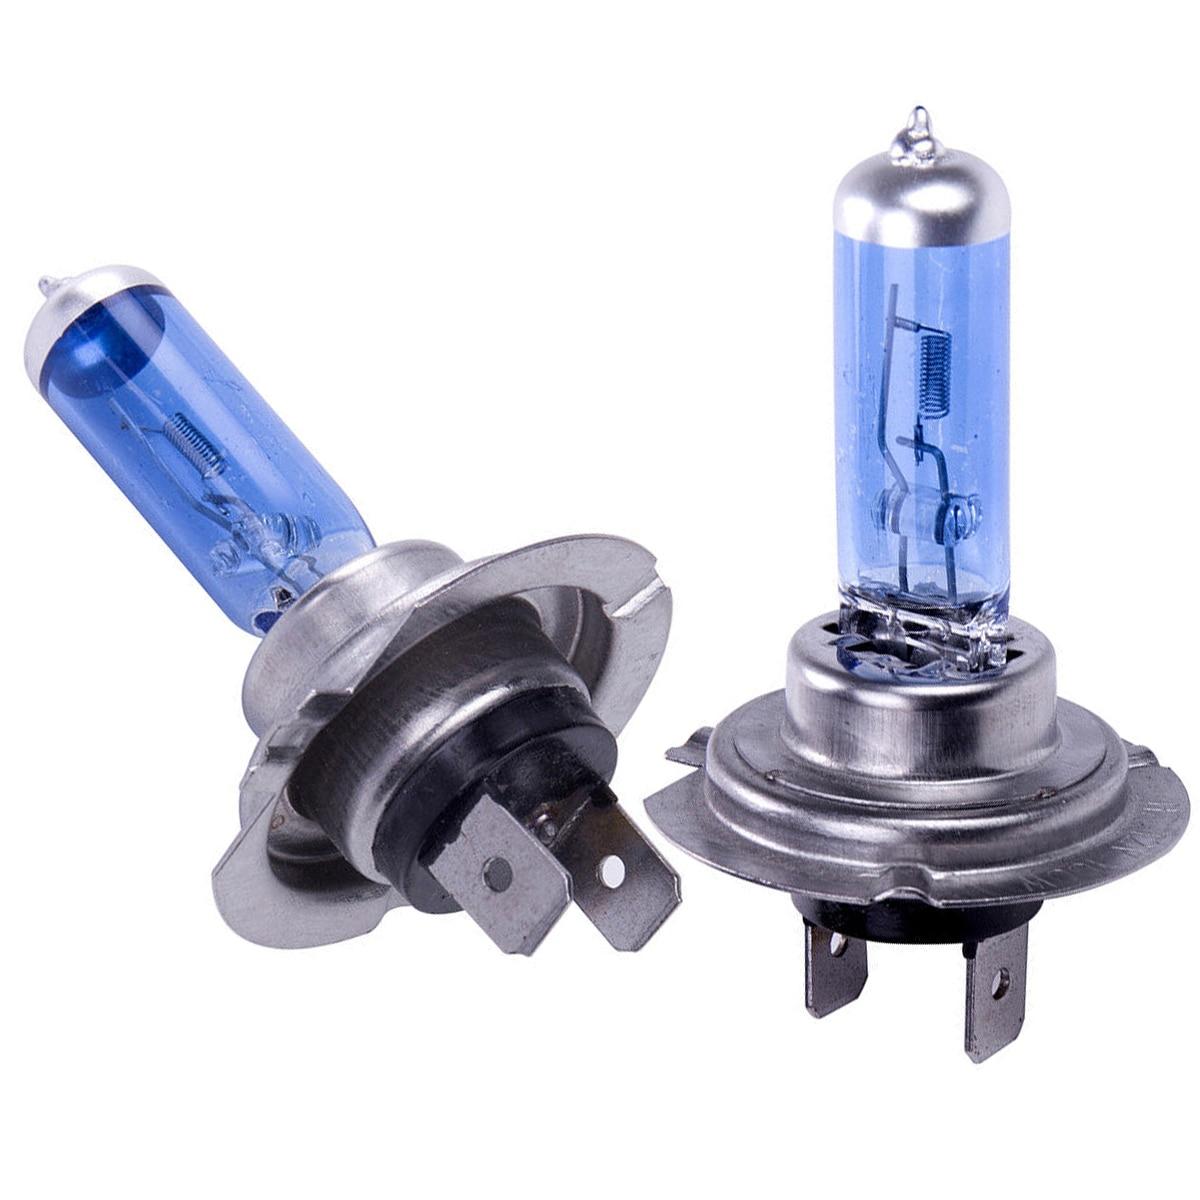 2x H7  100W H7 Headlight Bulbs 8500k Xenon Lamp Hide Super White Effect Headlight Lamps Light Bulbs 12V